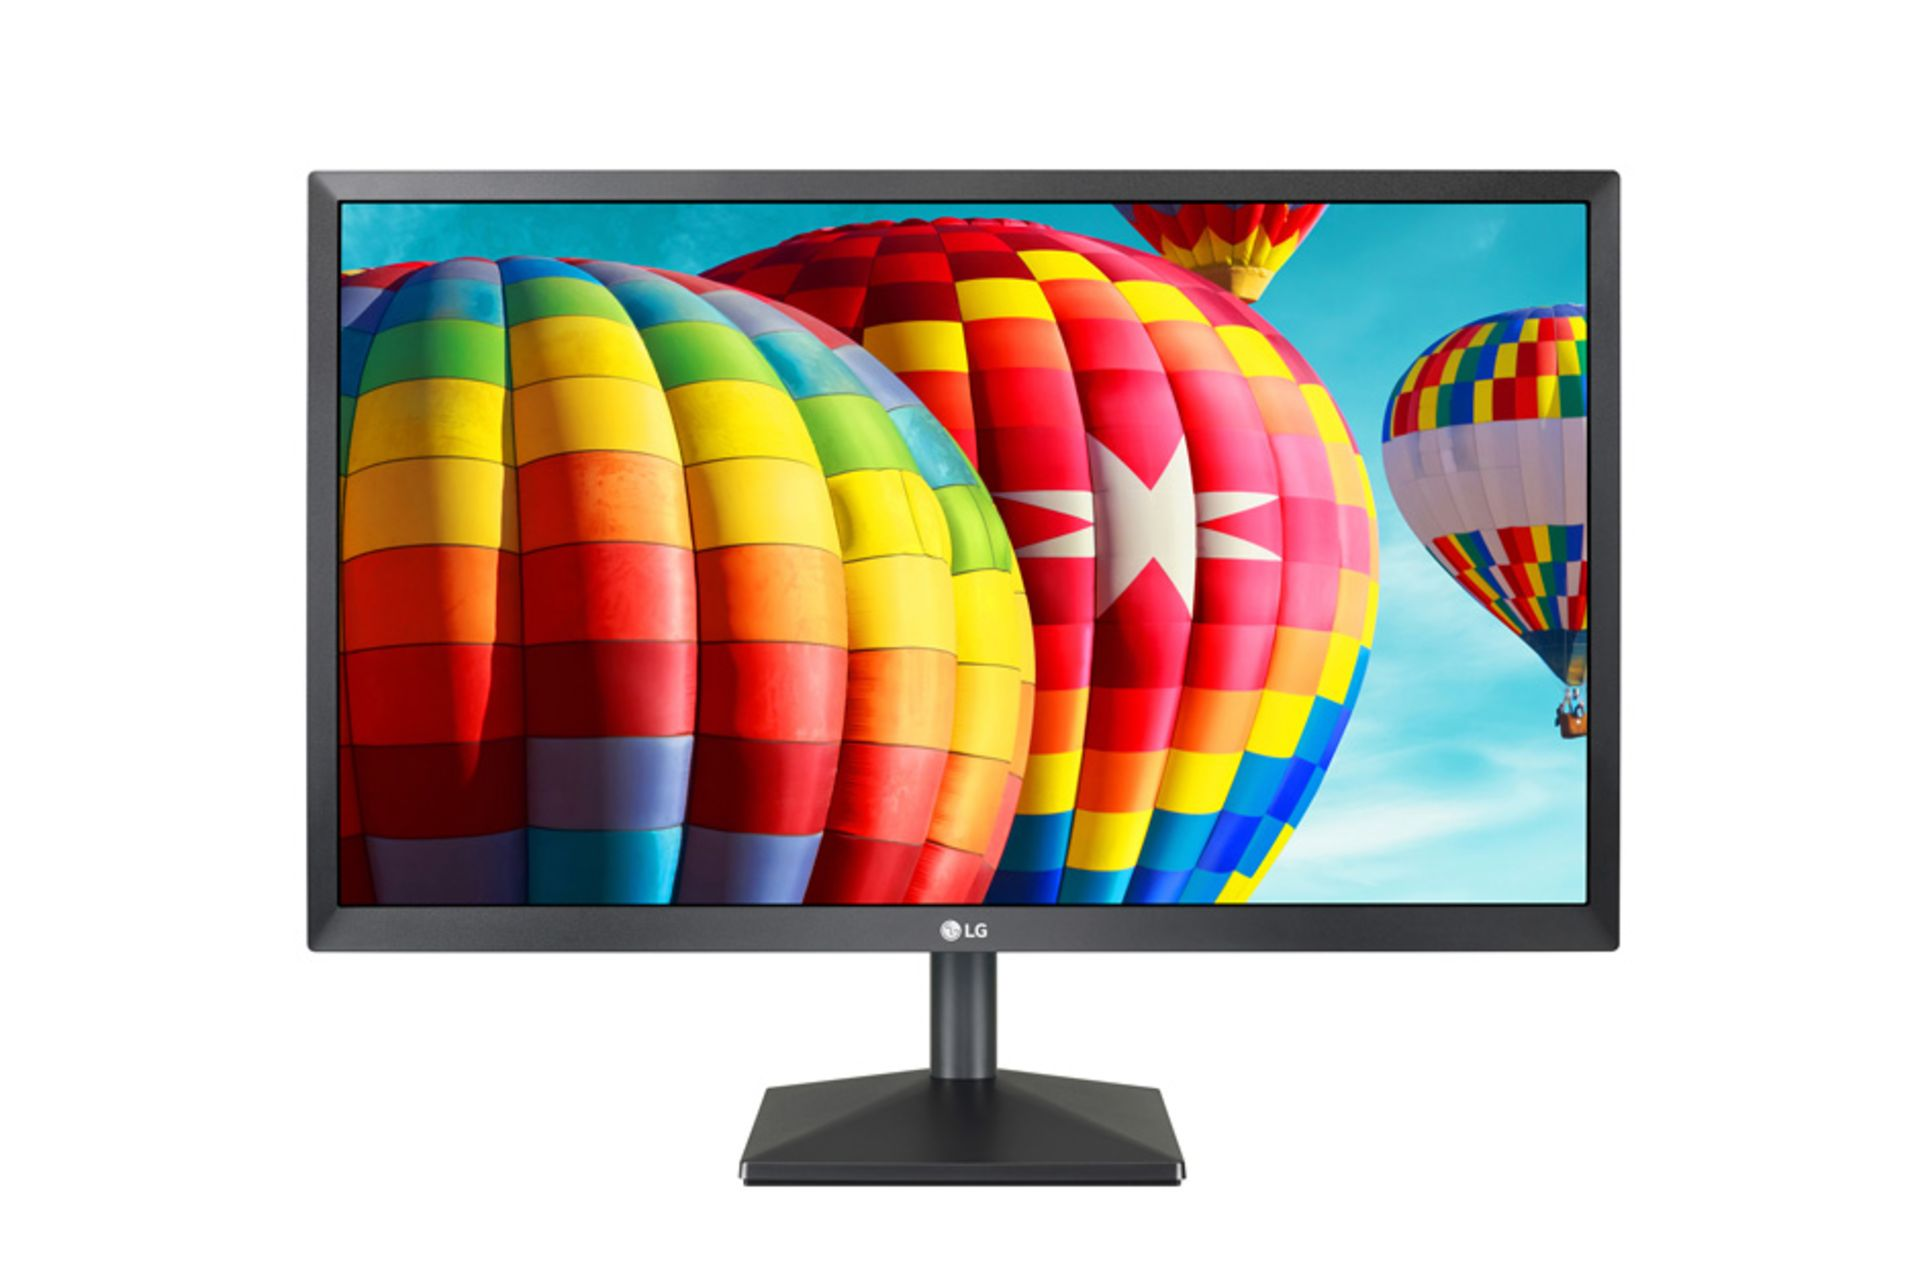 Lot 16011 - V Grade A LG 22 Inch FULL HD IPS LED MONITOR - D-SUB, HDMI 22MK430H